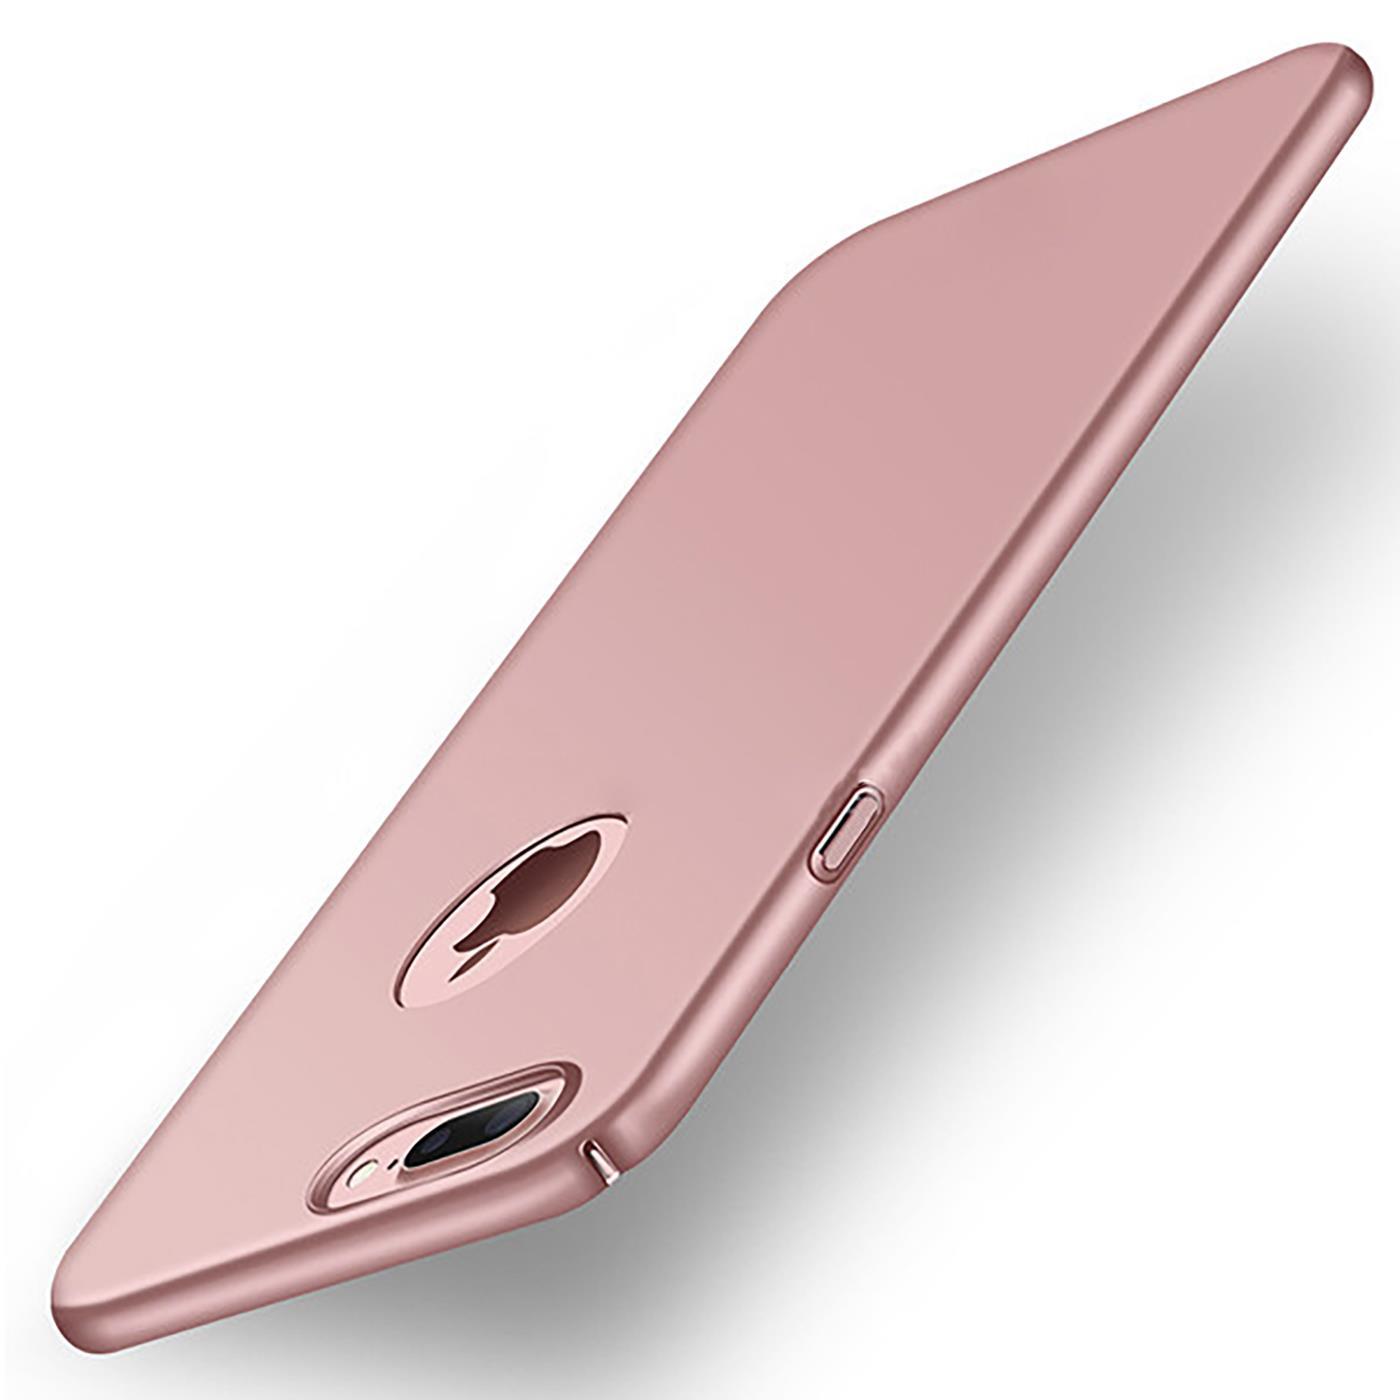 Handy Case Apple iPhone 6 S Plus Hülle Schutz Cover Slim ...